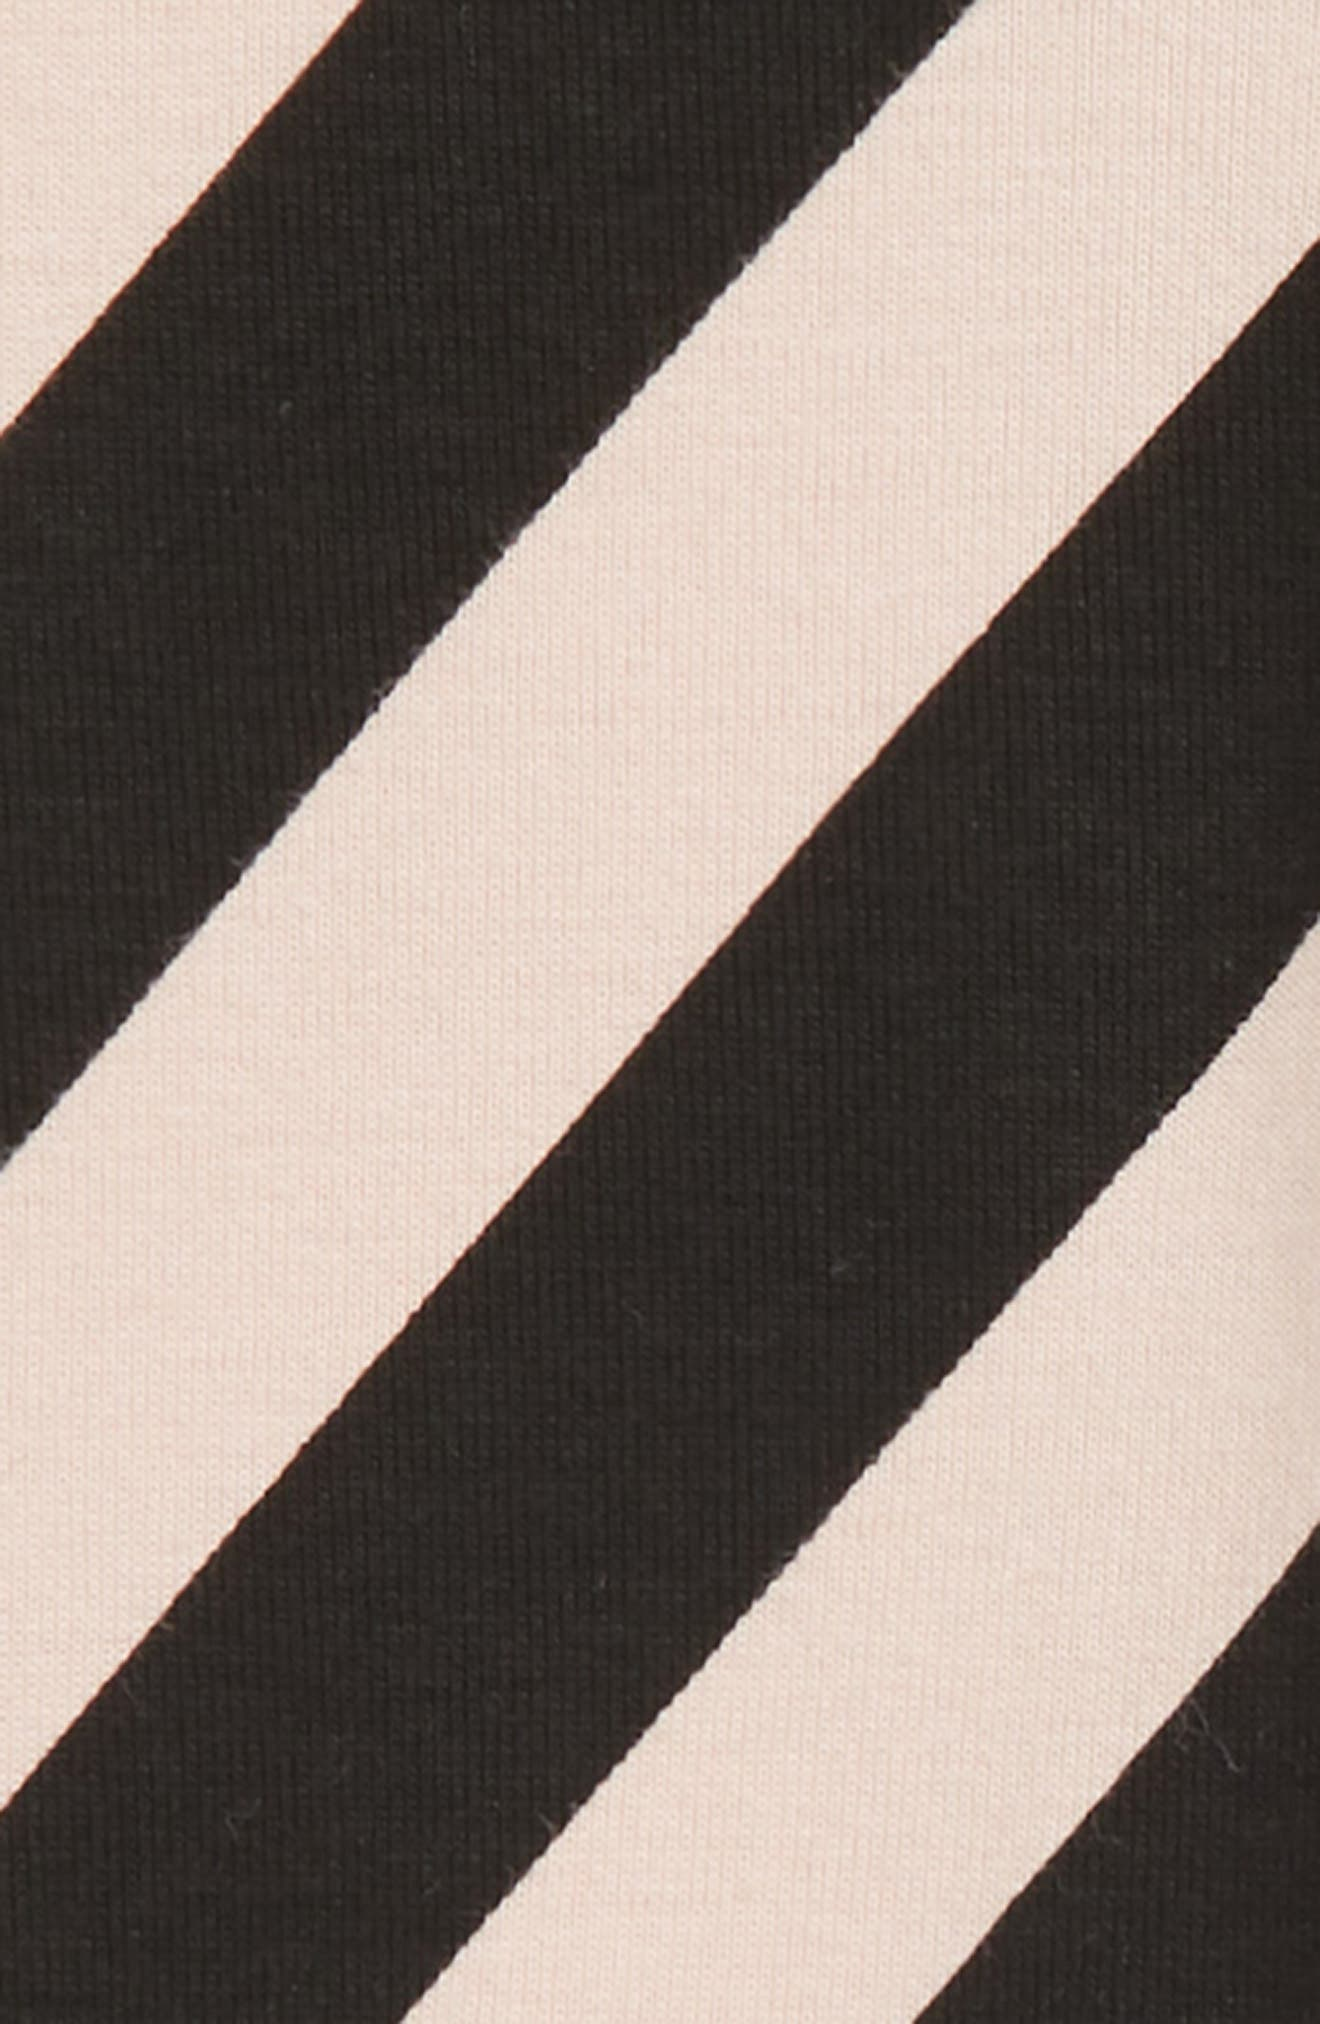 Striped Leggings,                             Alternate thumbnail 2, color,                             POWDER PINK